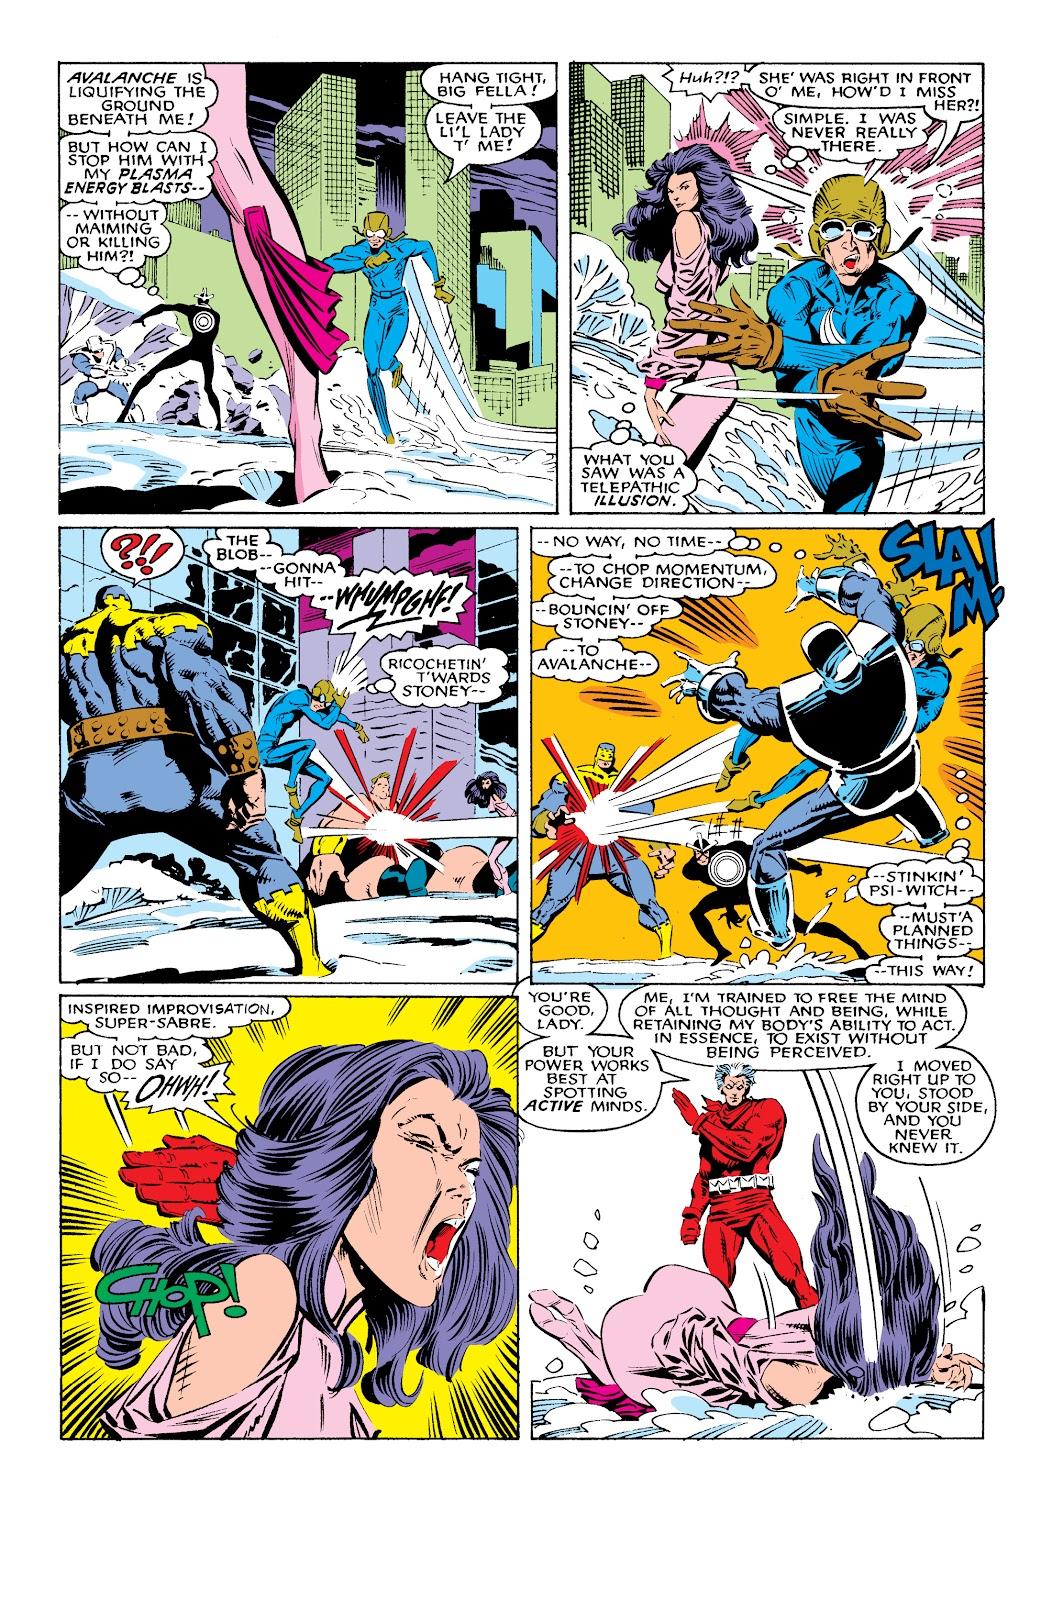 Read online X-Men Milestones: Fall of the Mutants comic -  Issue # TPB (Part 1) - 23